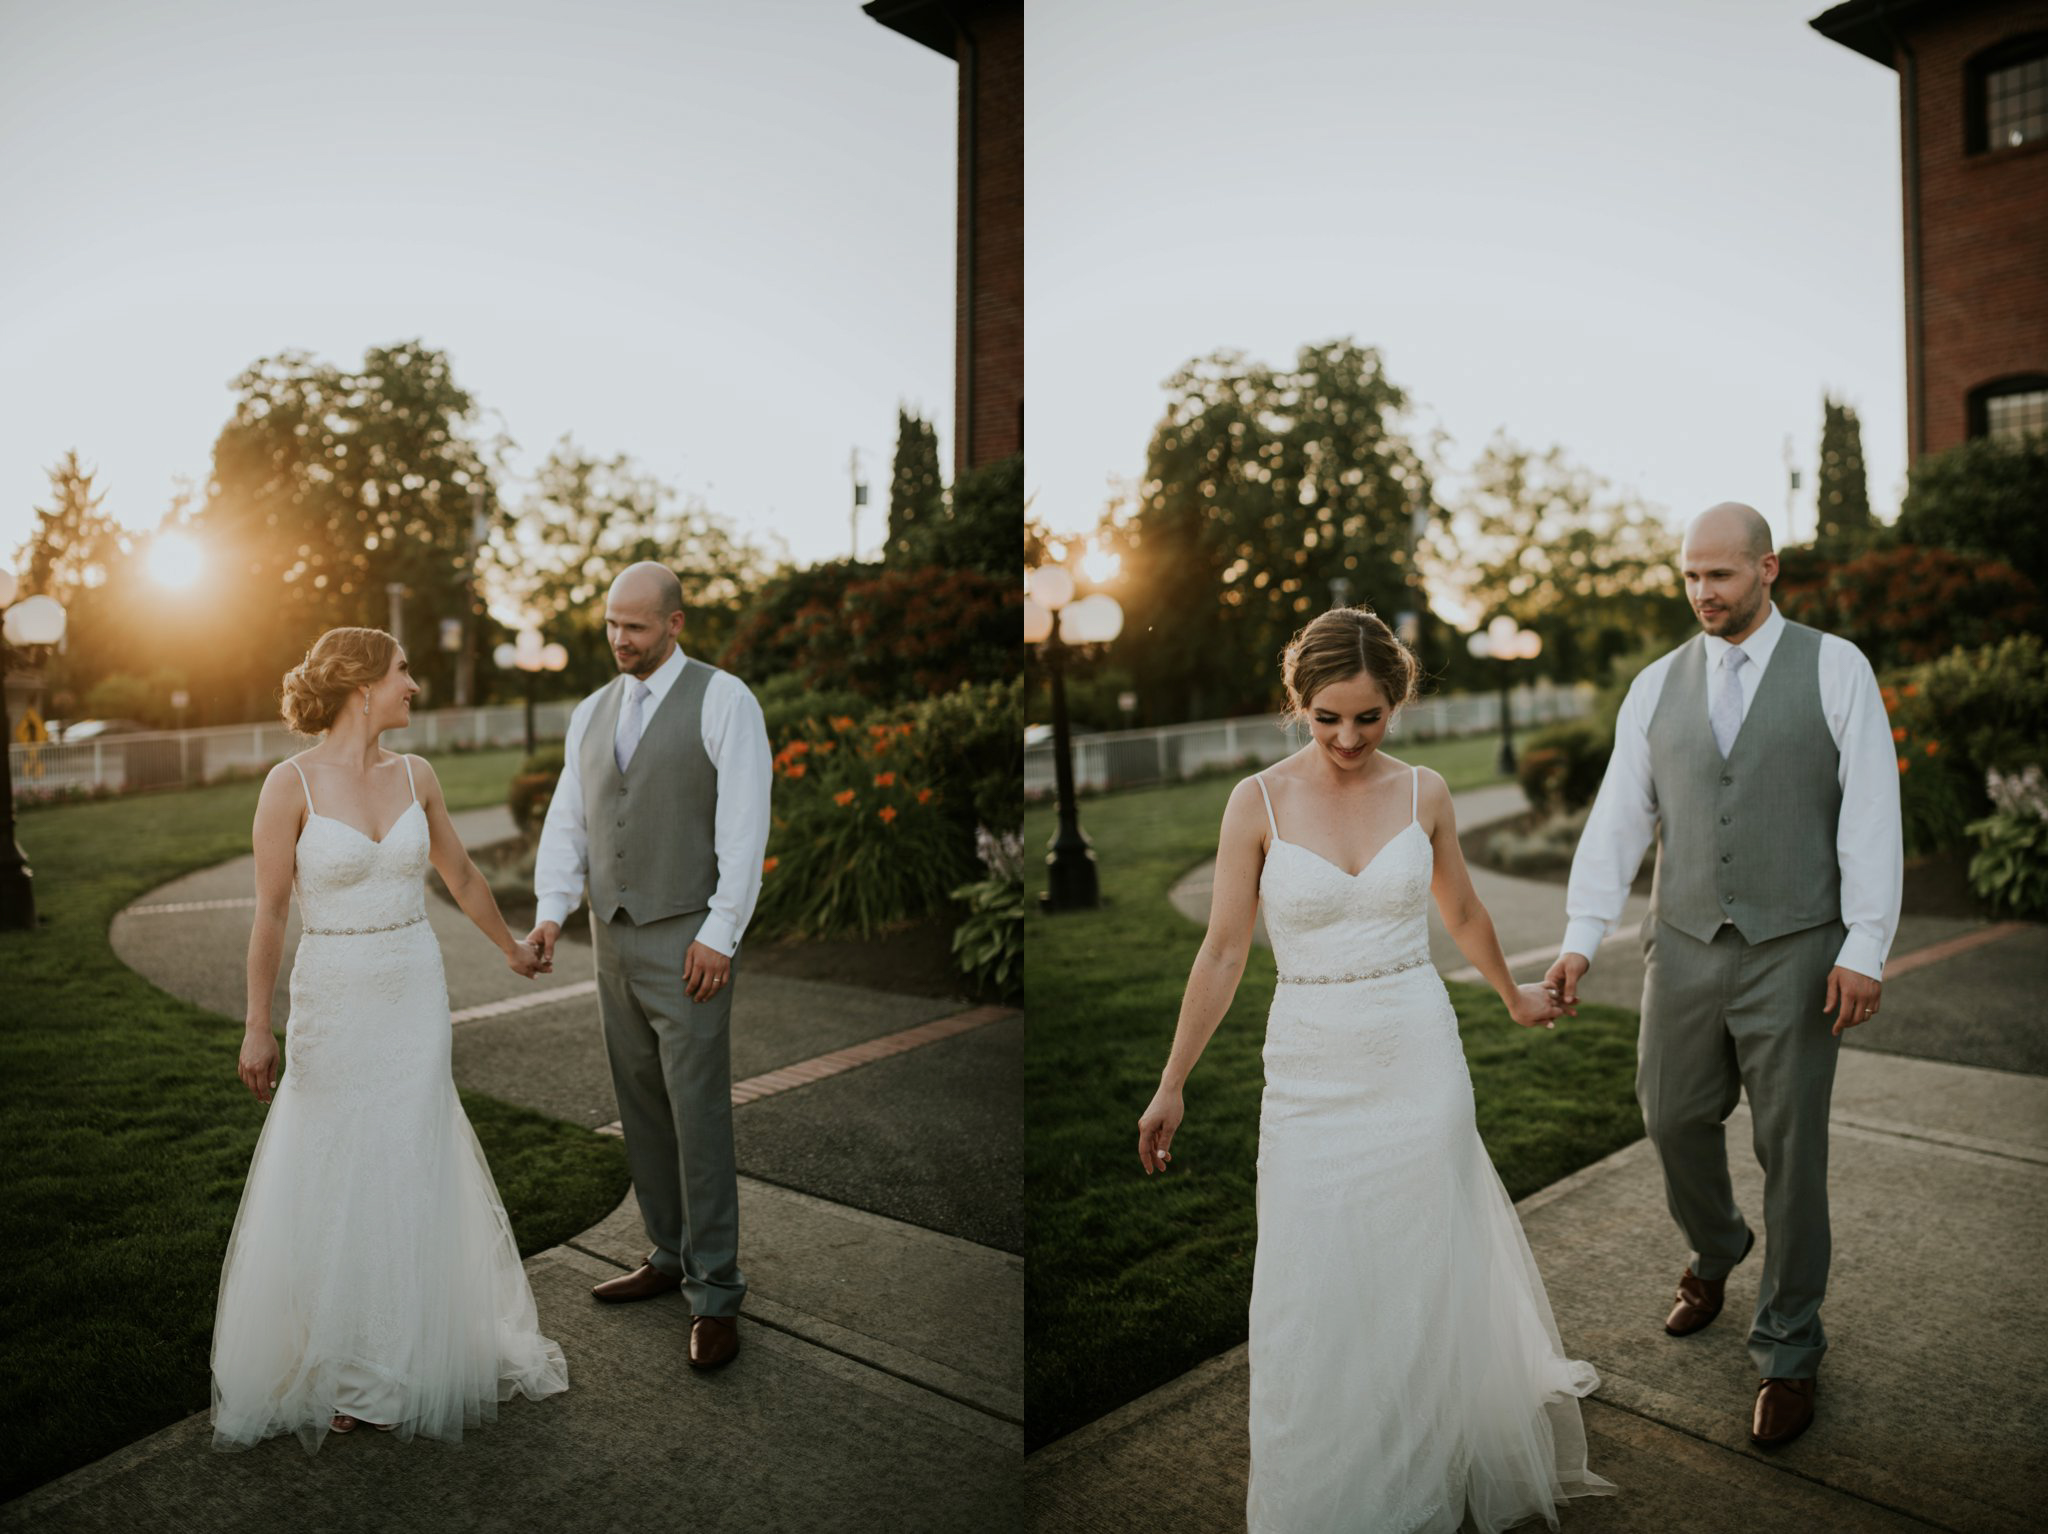 hollywood-school-house-wedding-seattle-photographer-caitlyn-nikula-107.jpg